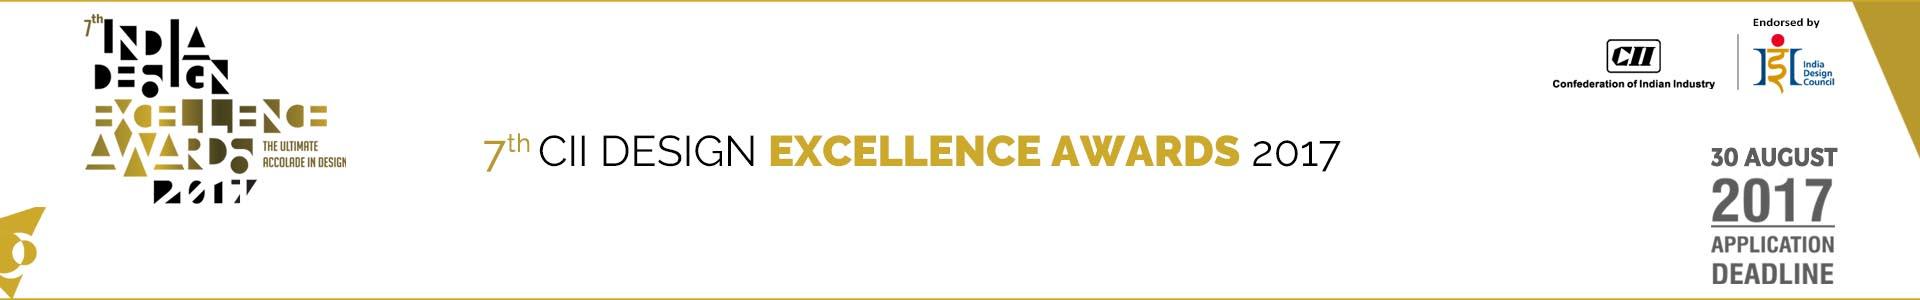 cii-design-excellence-awards-2017